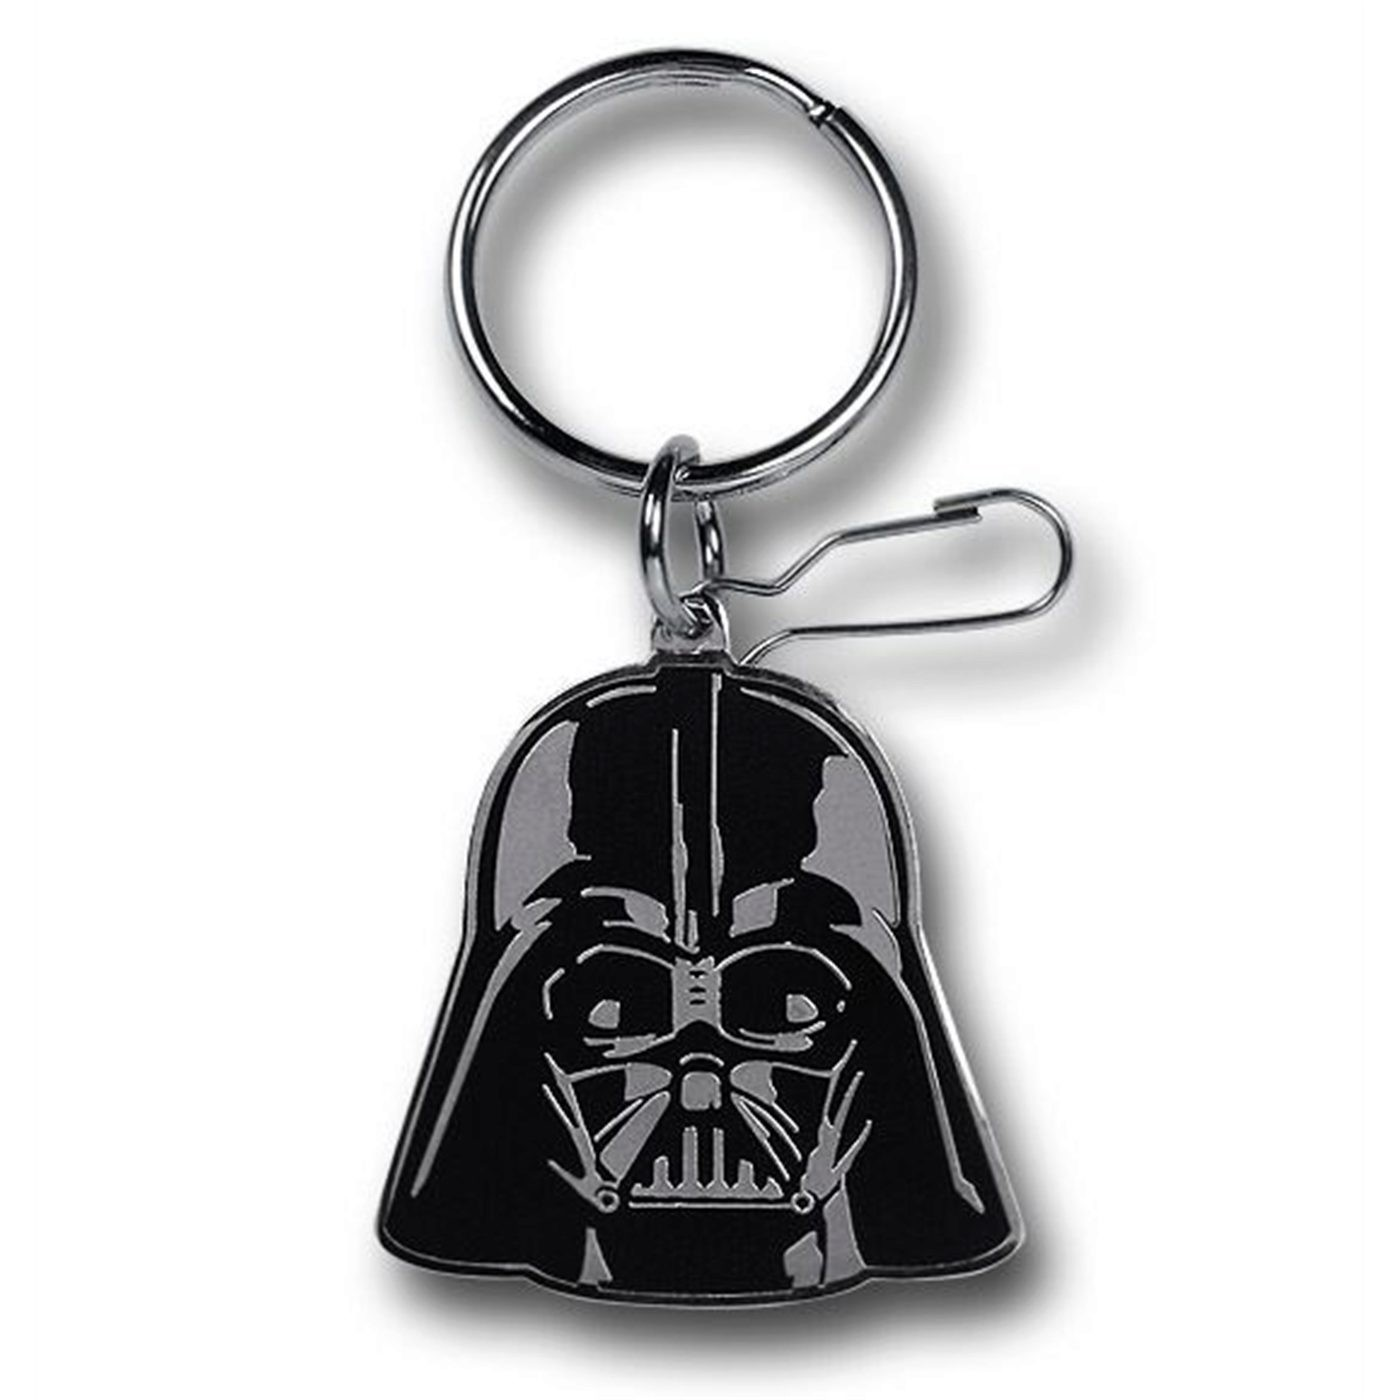 Star Wars Darth Vader Enamel Keychain